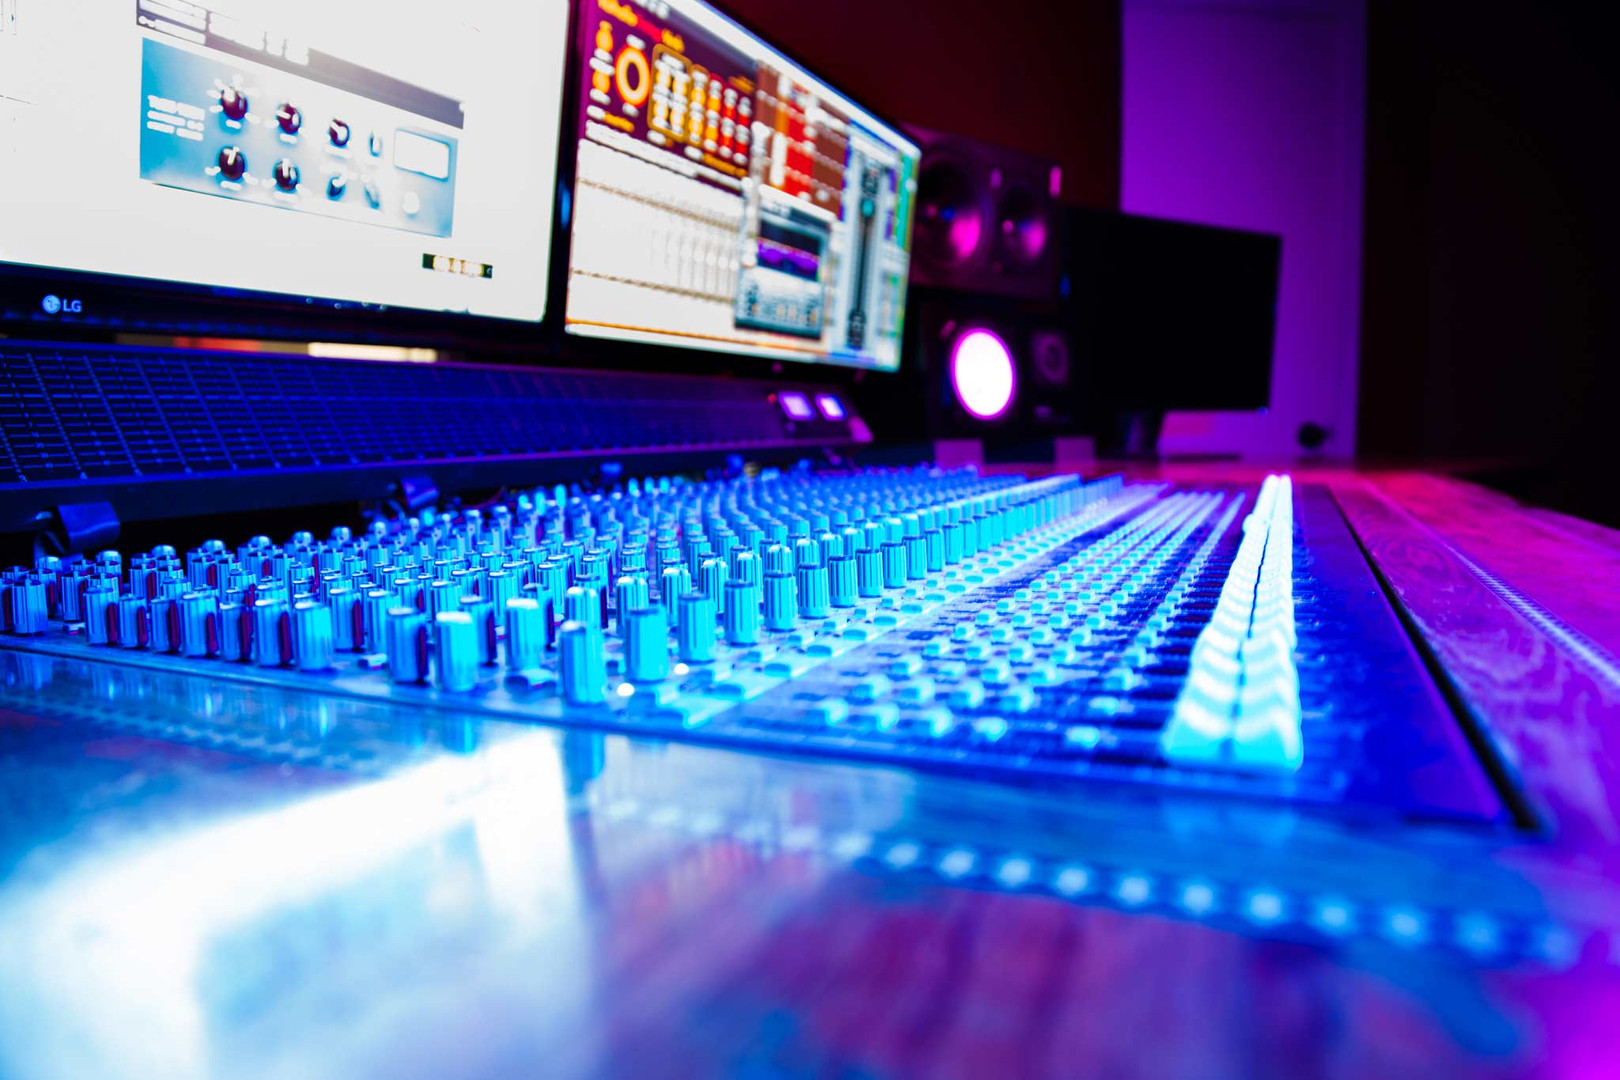 Undercaste-Studios-Desk-Colors-10.jpg